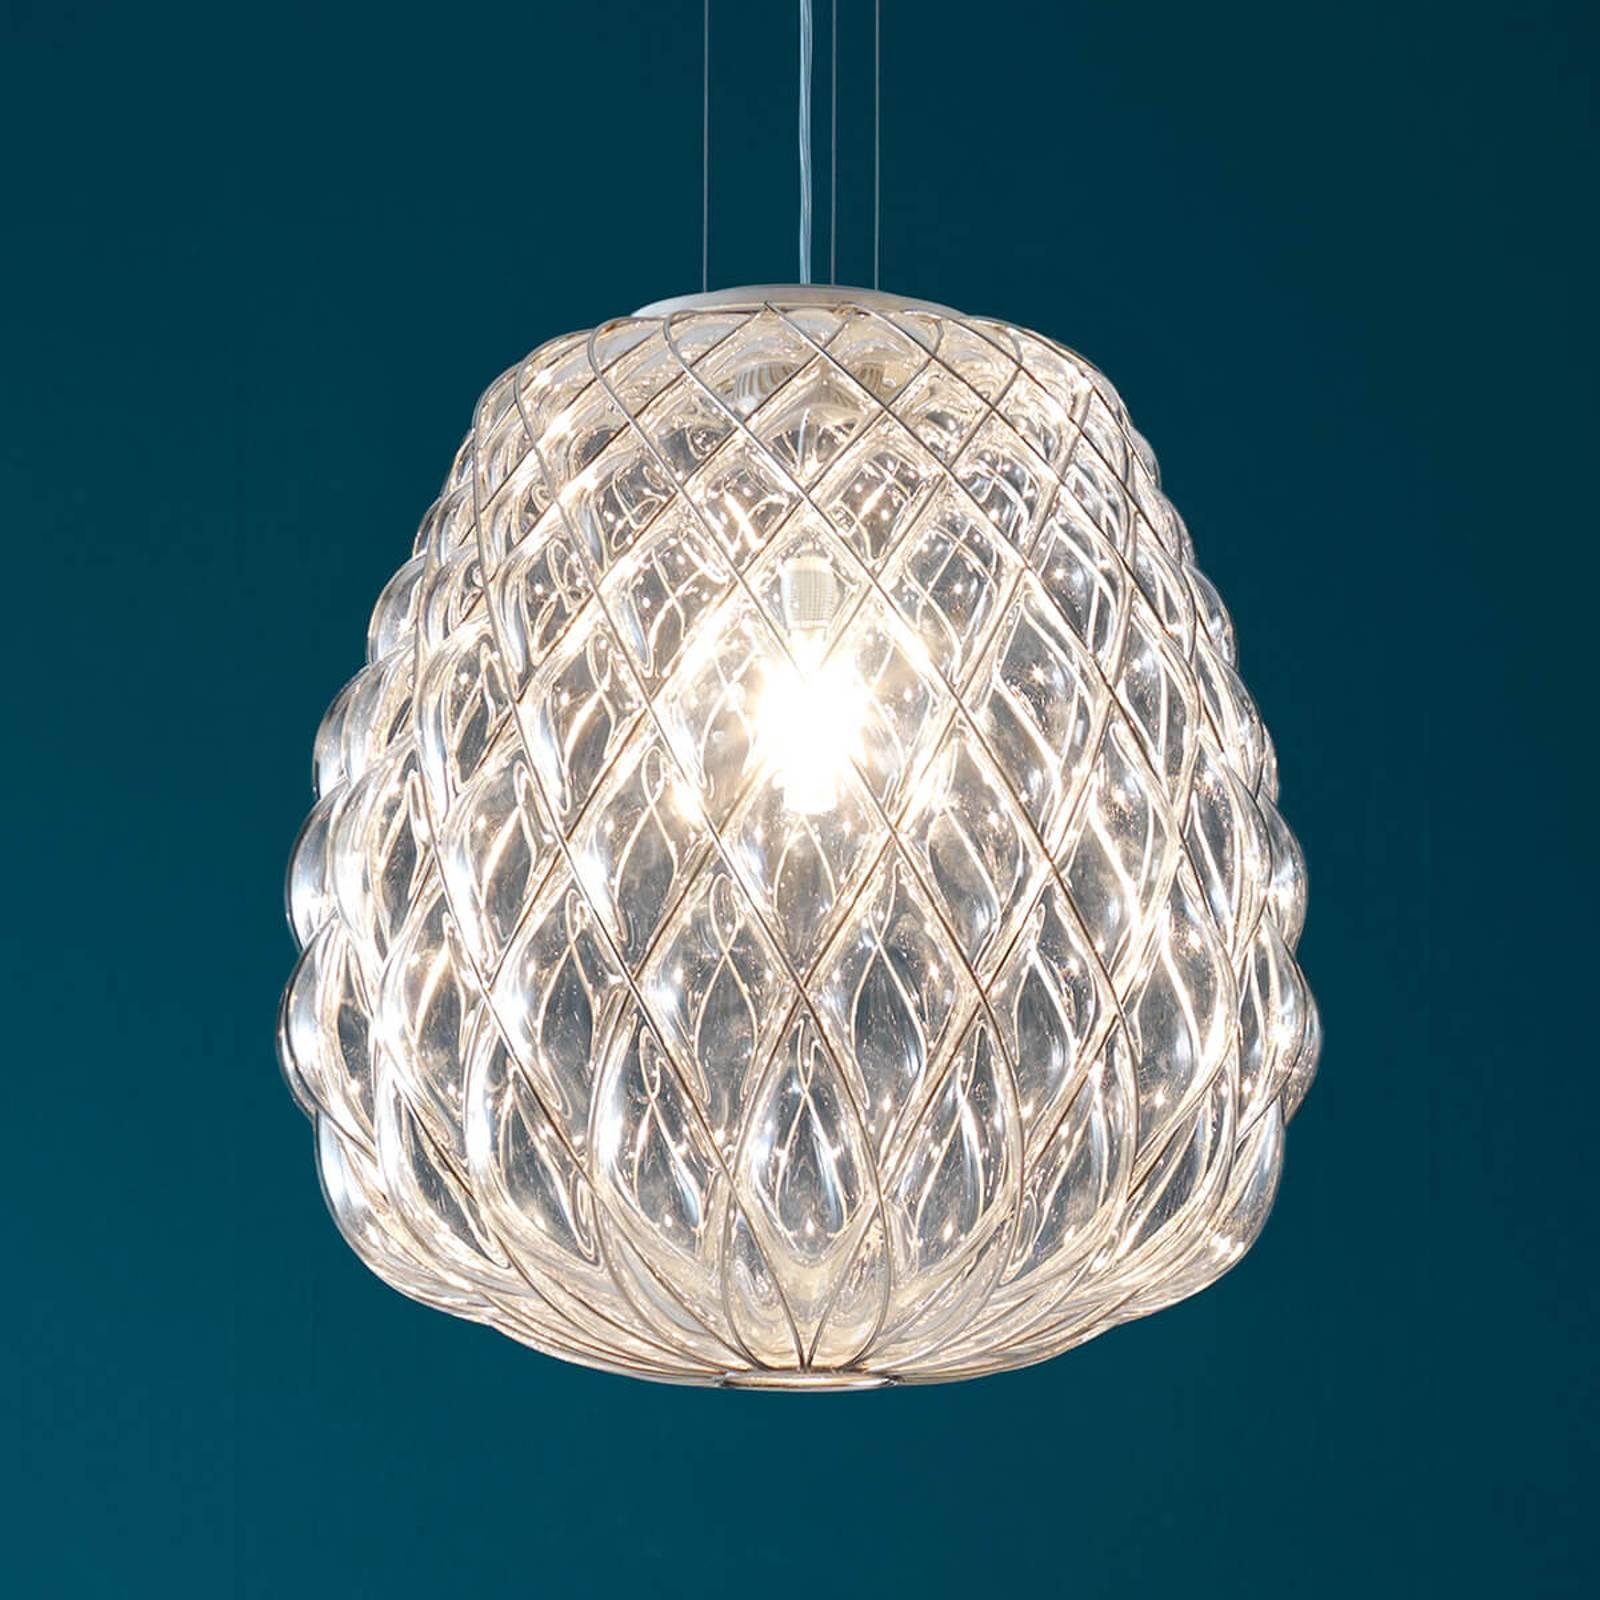 Glazen design hanglamp Pinecone